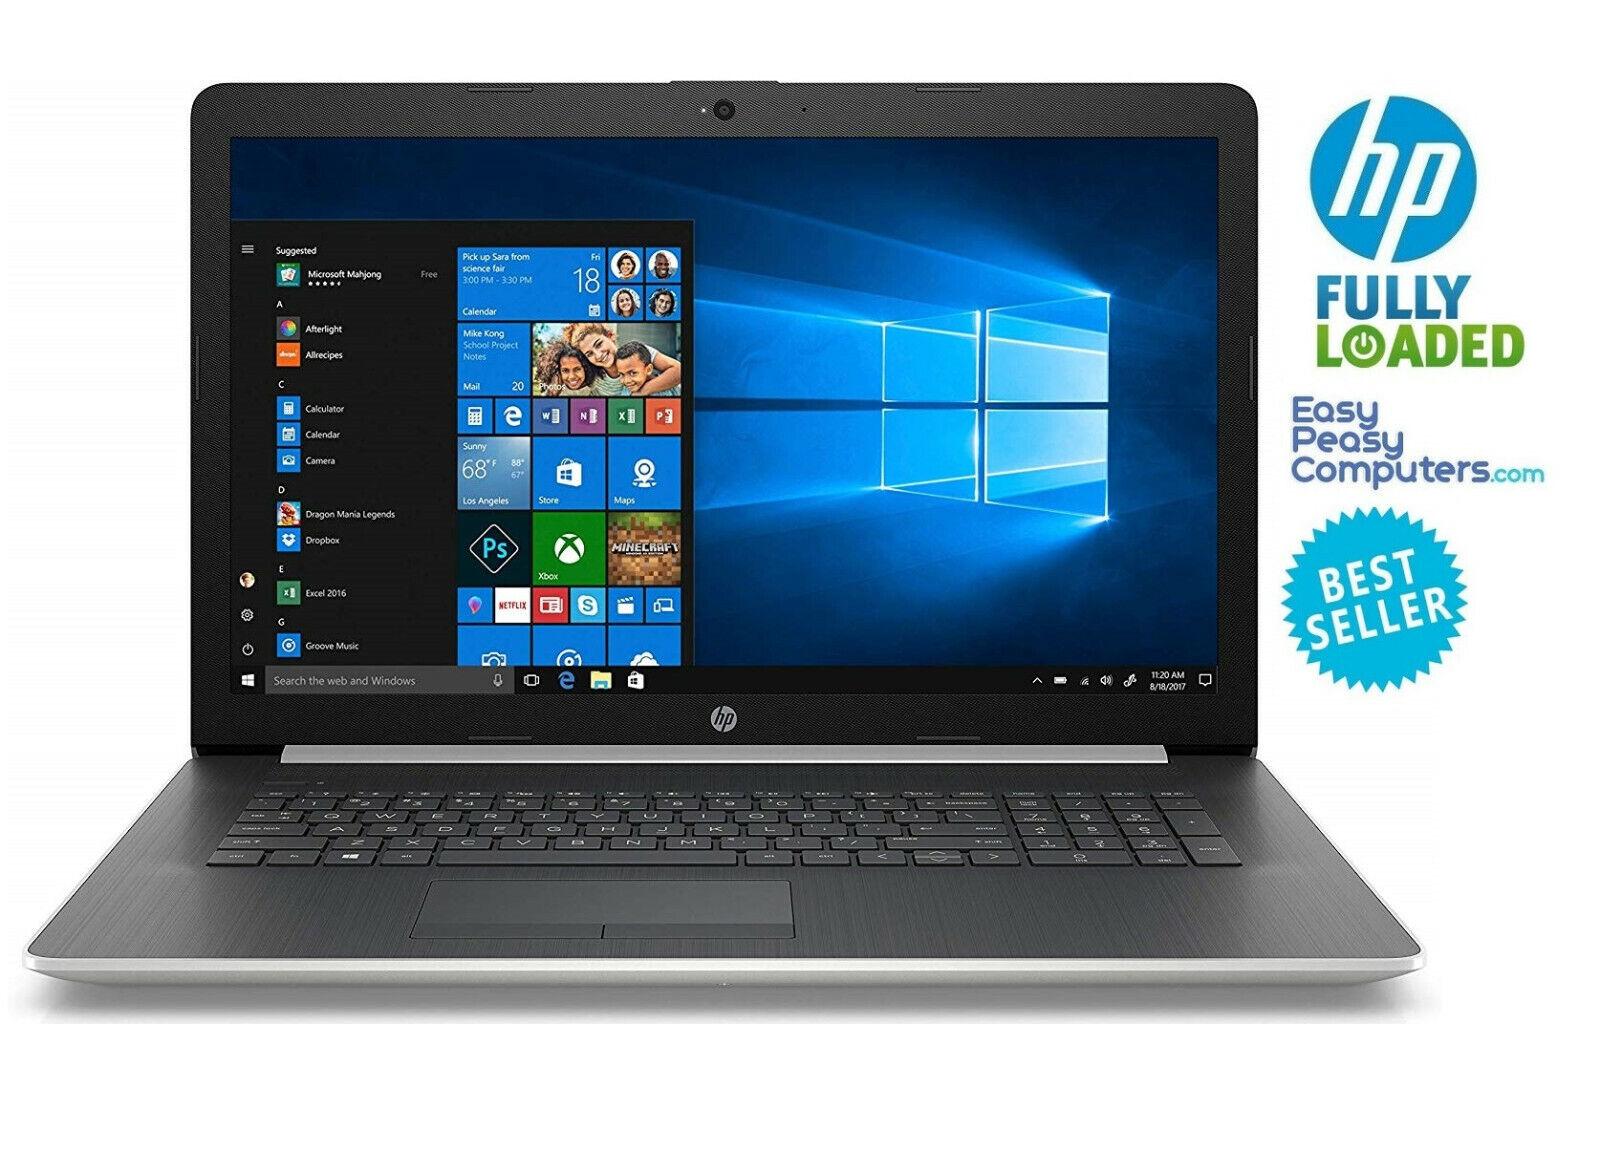 "Laptop Windows - HP Laptop 17.3"" Windows 10 8GB 1TB DVD+RW Webcam WiFi Bluetooth (FULLY LOADED)"